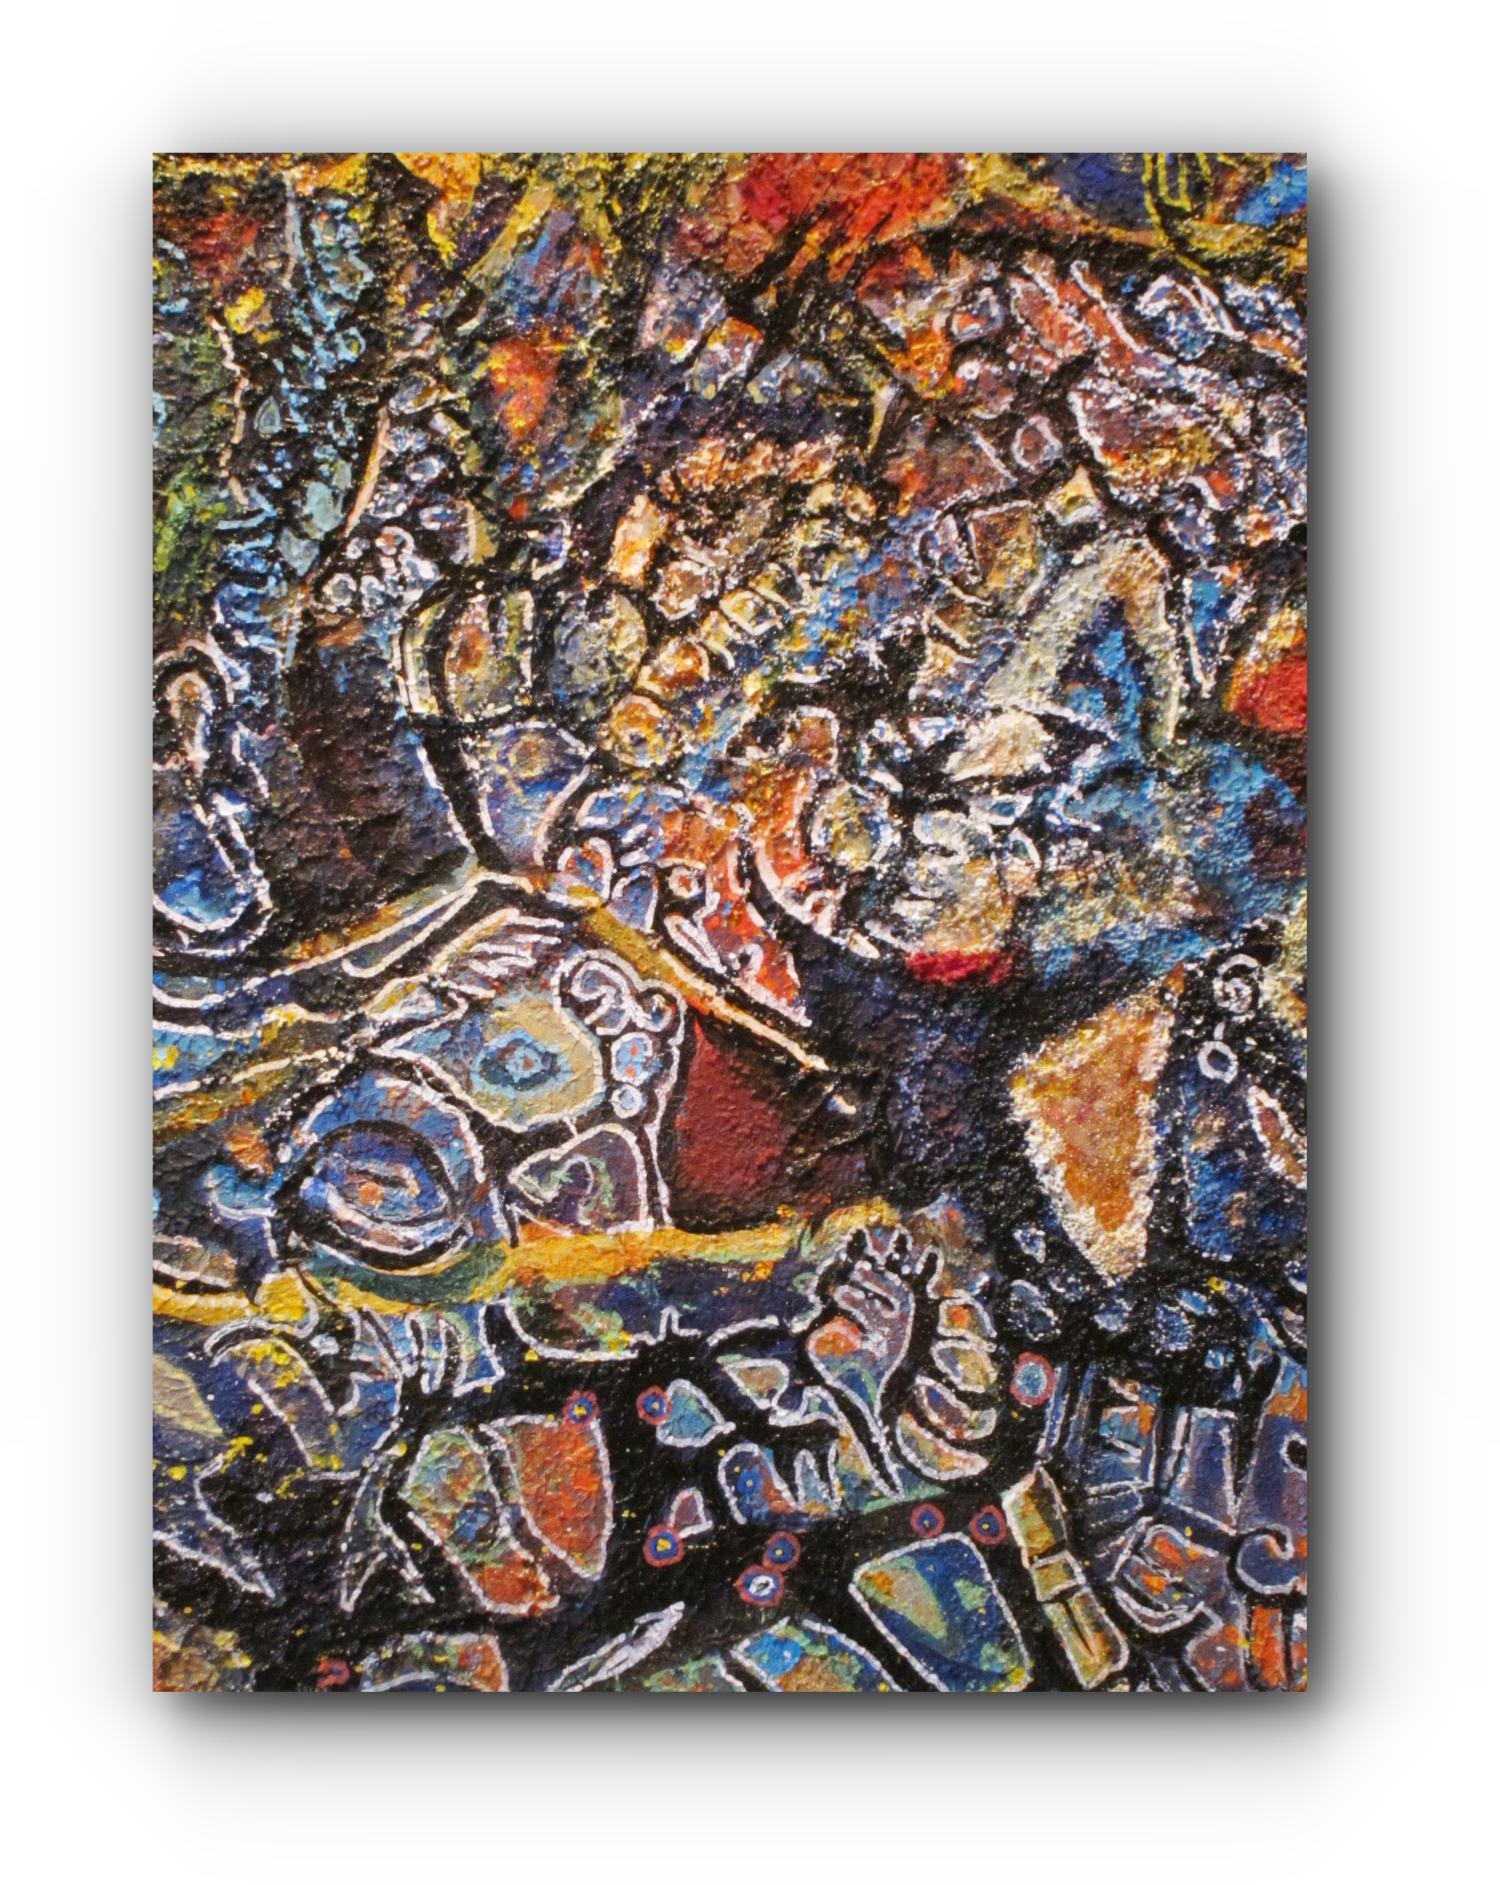 painting-detail-1-wisdom-trout-artists-ingress-vortices.jpg